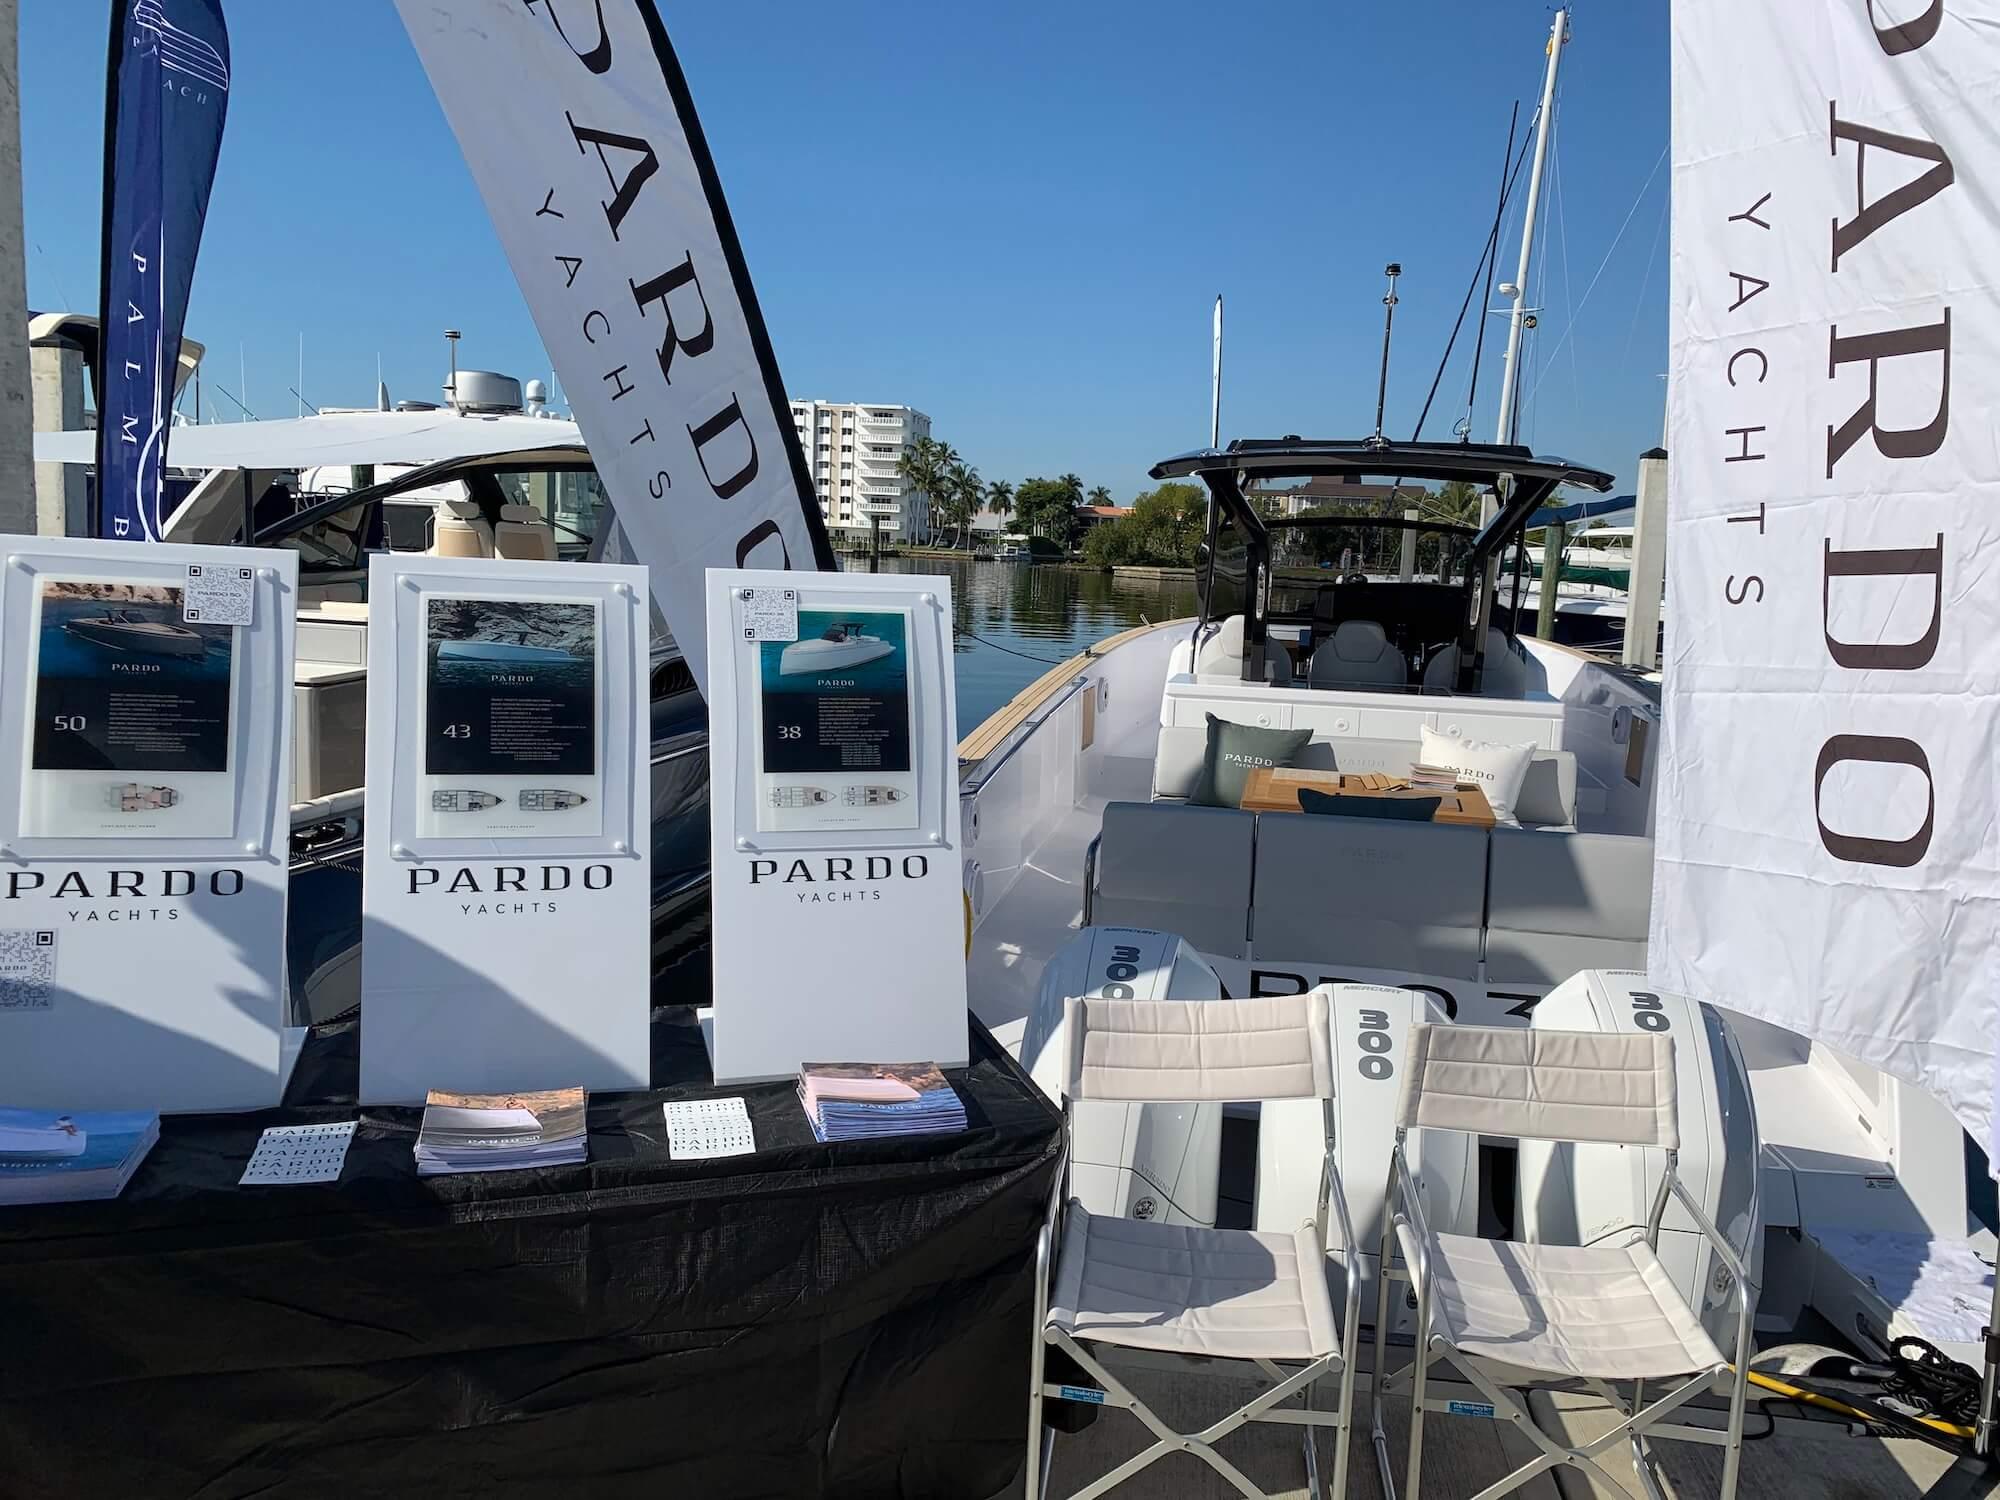 Naples Boat Show 2021